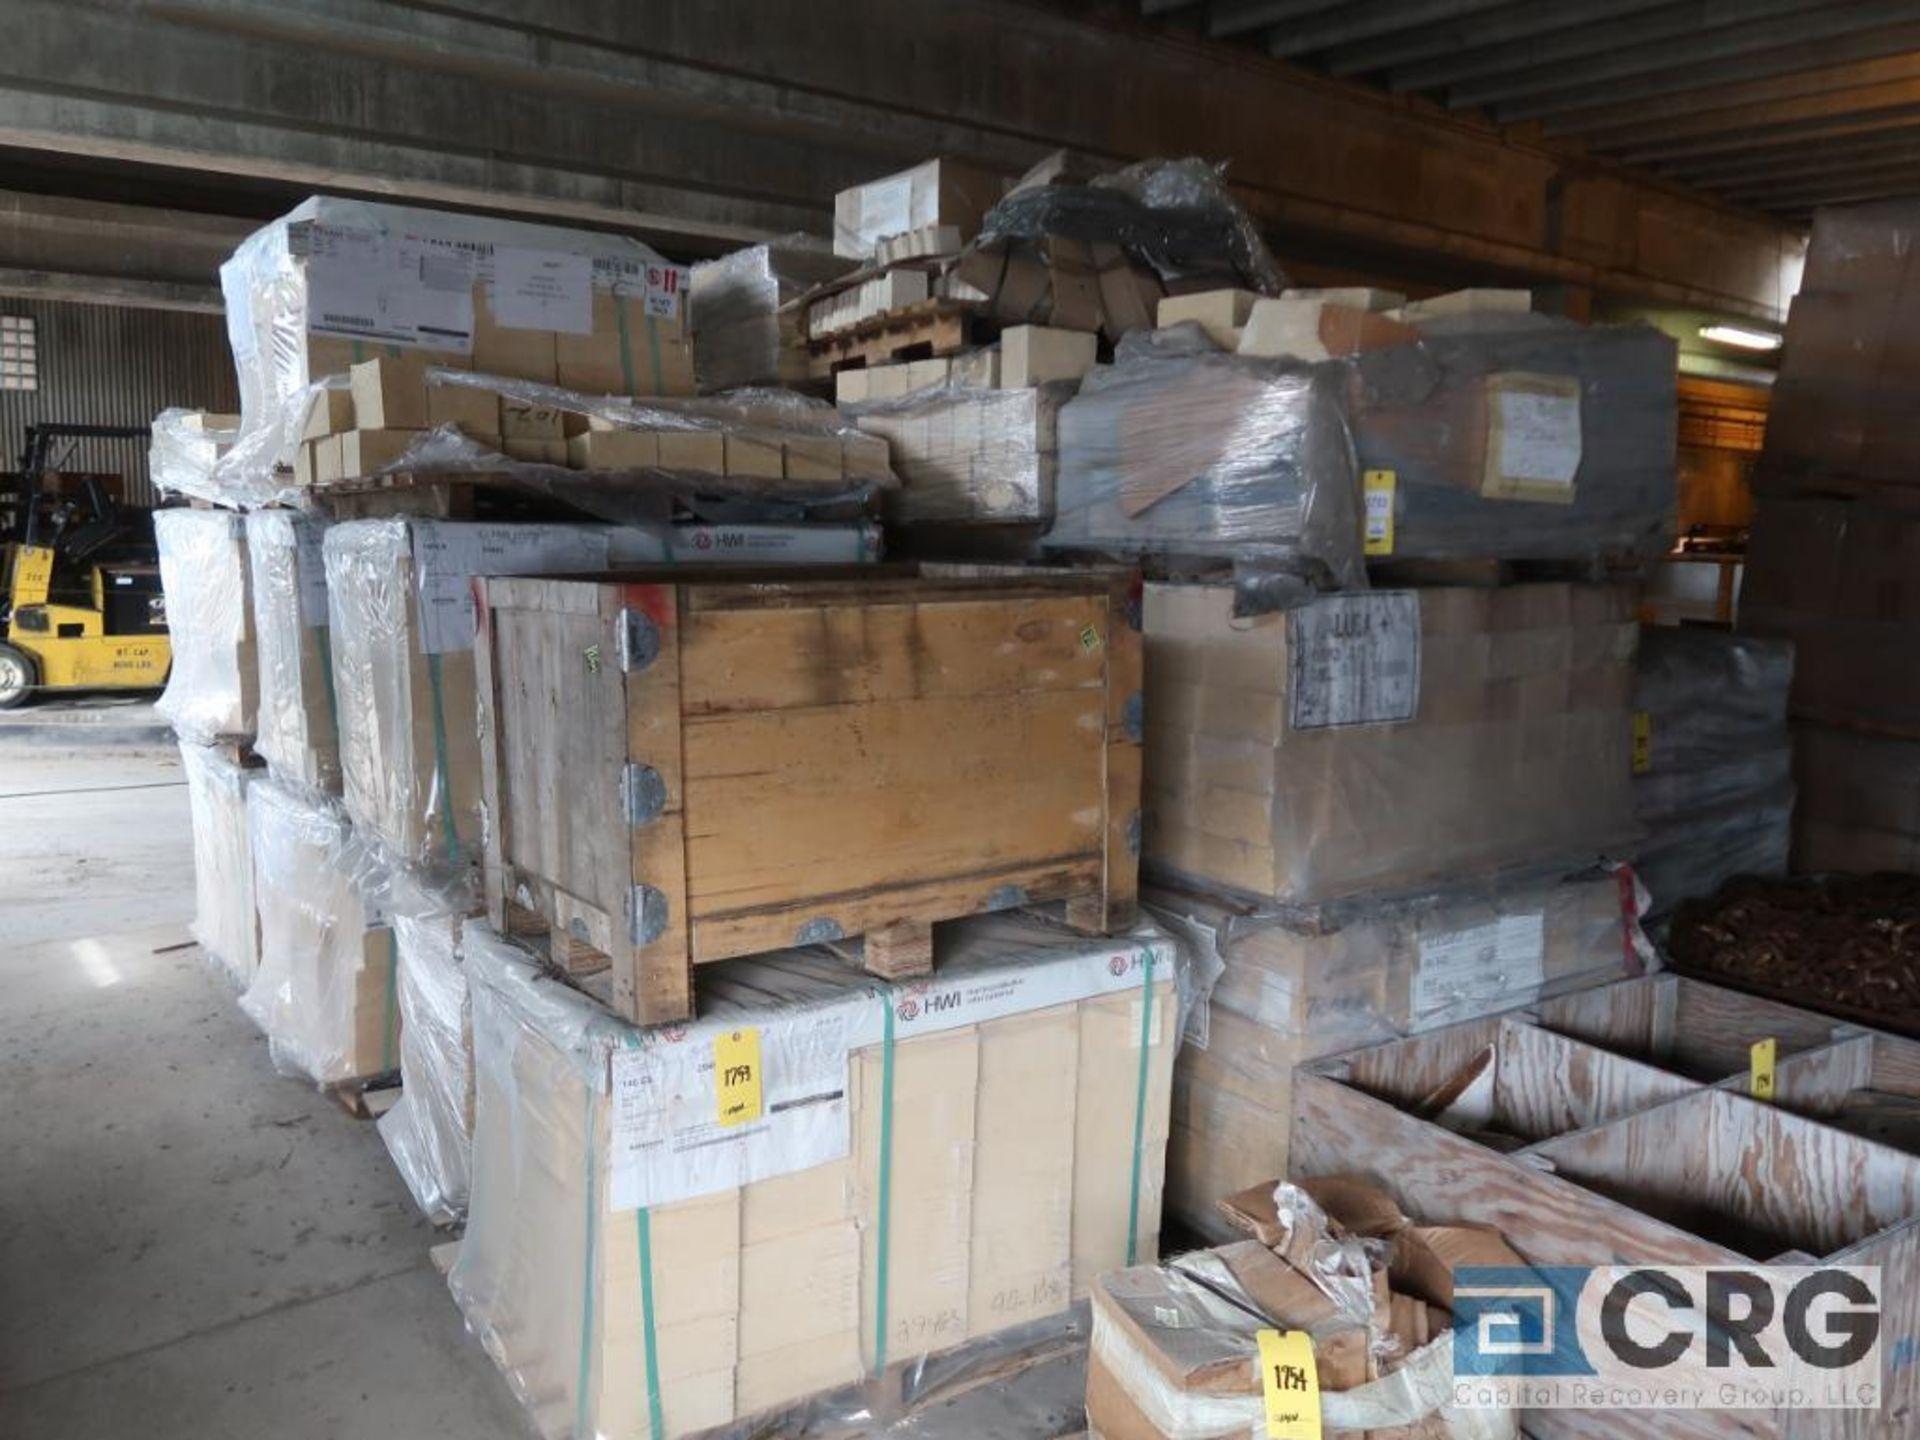 Lot of (31) pallets kiln brick, (1) pallet crete block mix, and (3) pallets ceramic coupling (Next